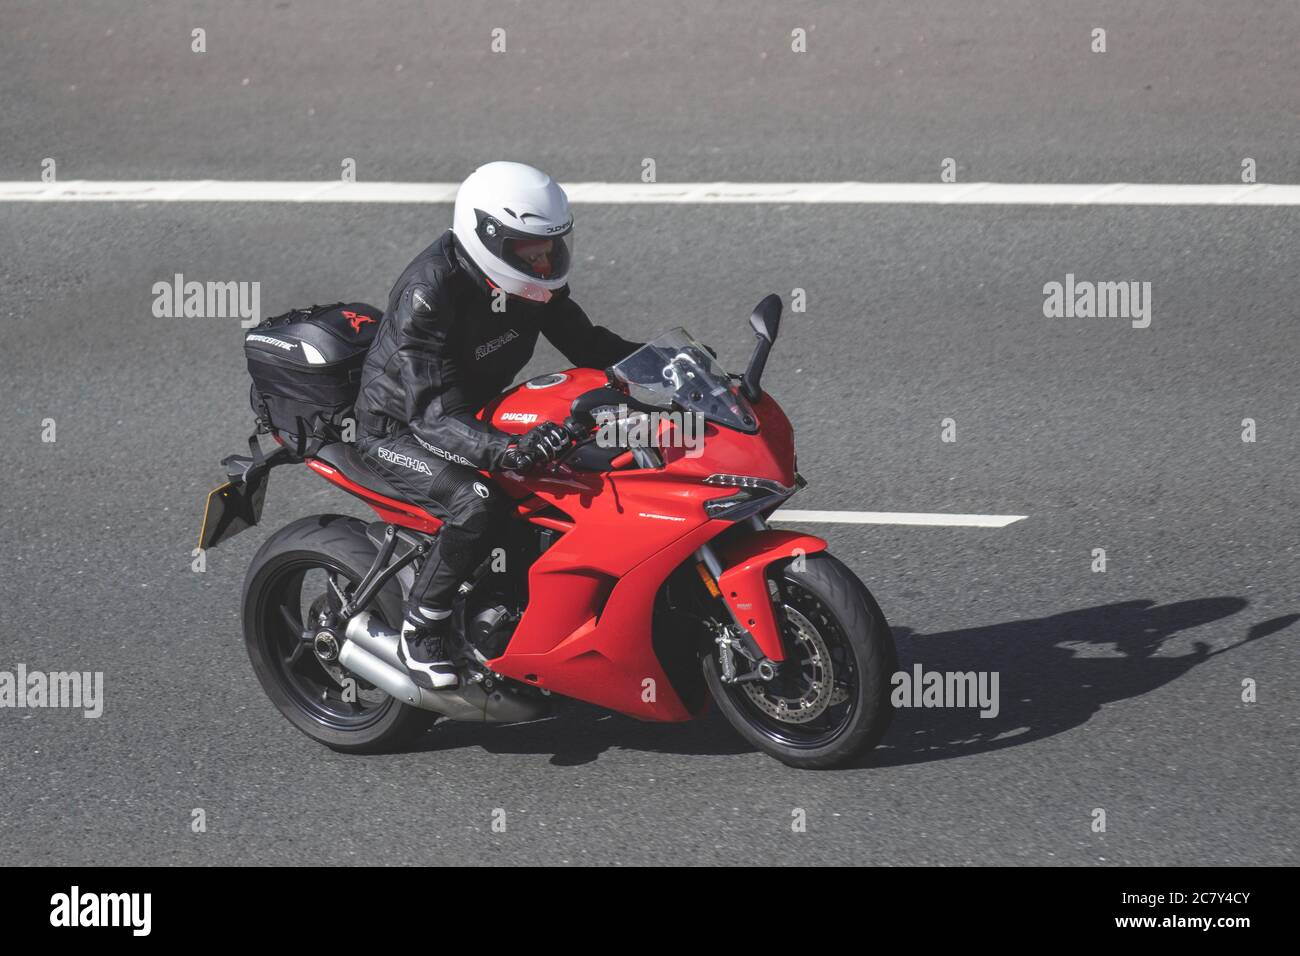 Ducati supersports motorcycle; Motorbike rider, two wheeled transport, motorcycles, vehicle, roads, motorbikes, bike riders motoring in Chorley, UK Stock Photo